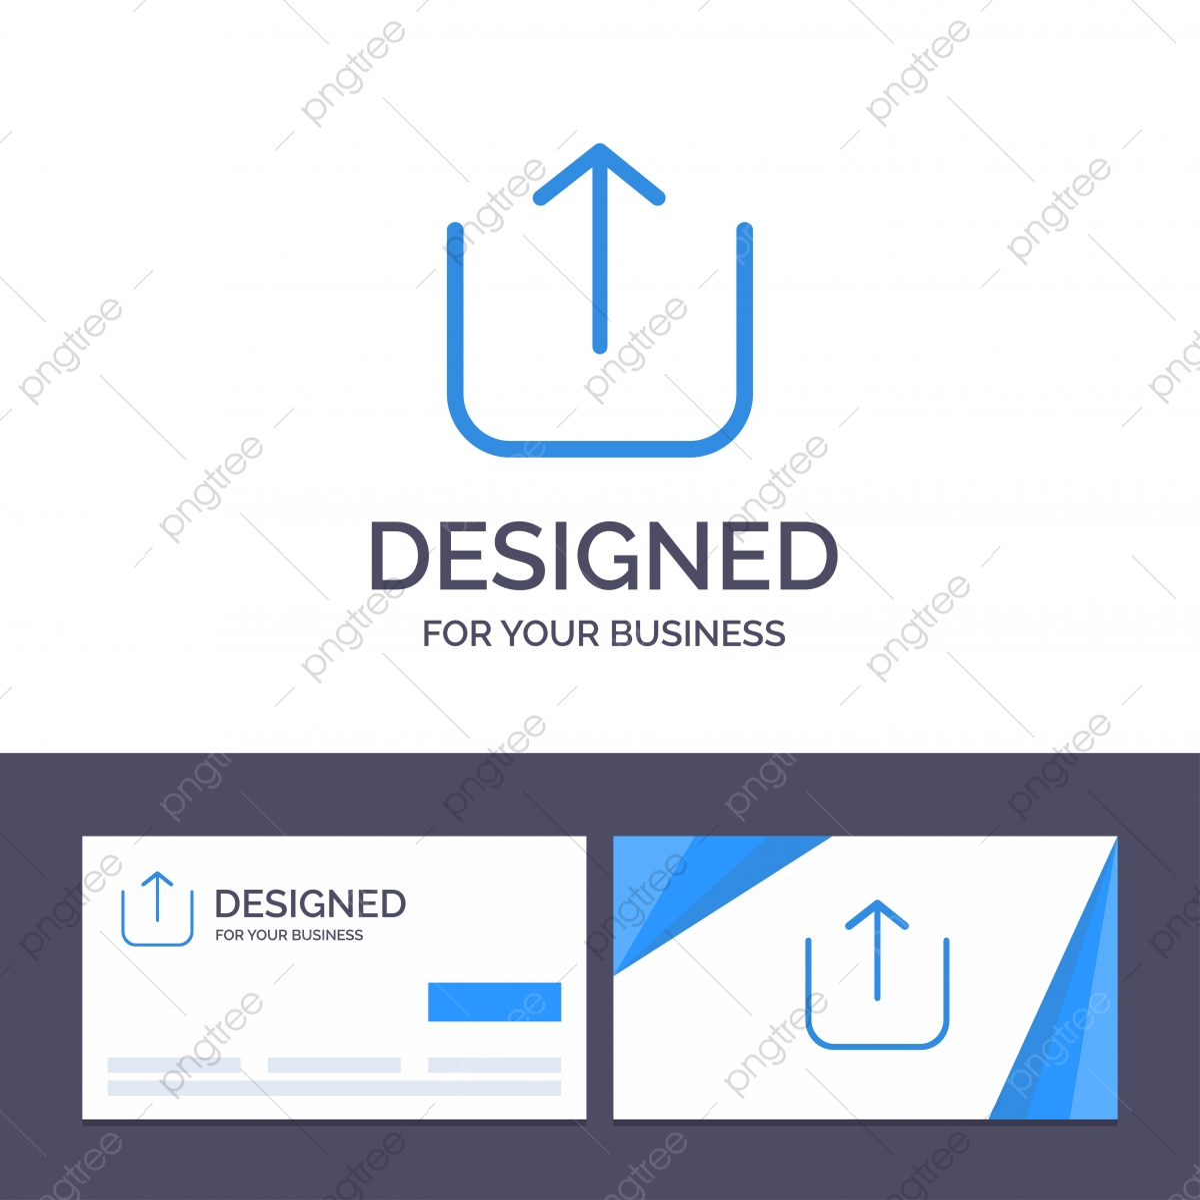 pngtree creative business card and logo template instagram up upload v png image 4791299